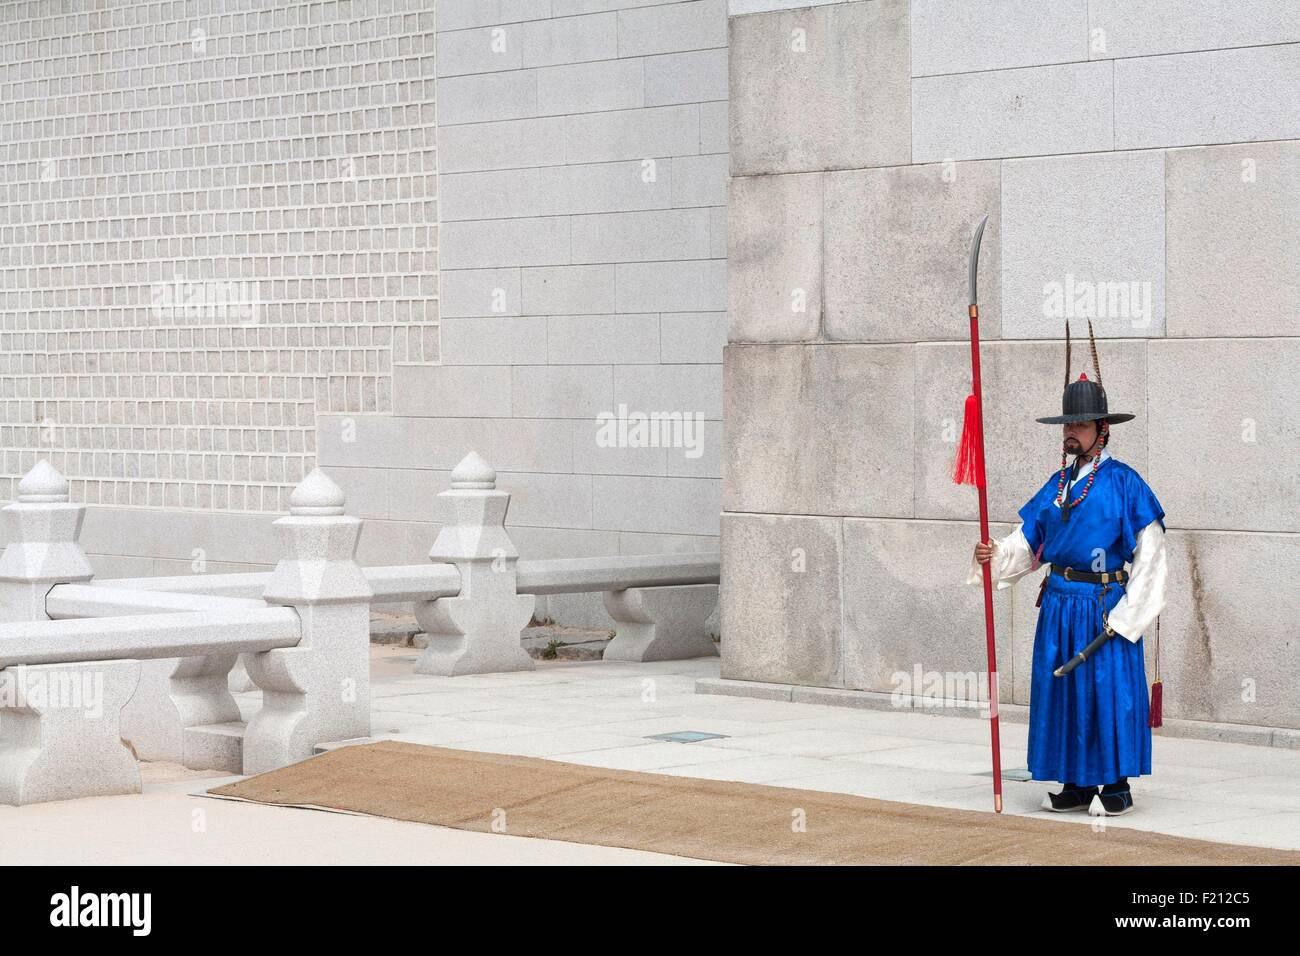 Corea del Sur, Seúl, Jongno-gu, Puerta Gwanghwamun Palacio Gyeongbokgung Gwanghwa, Niñera Imagen De Stock